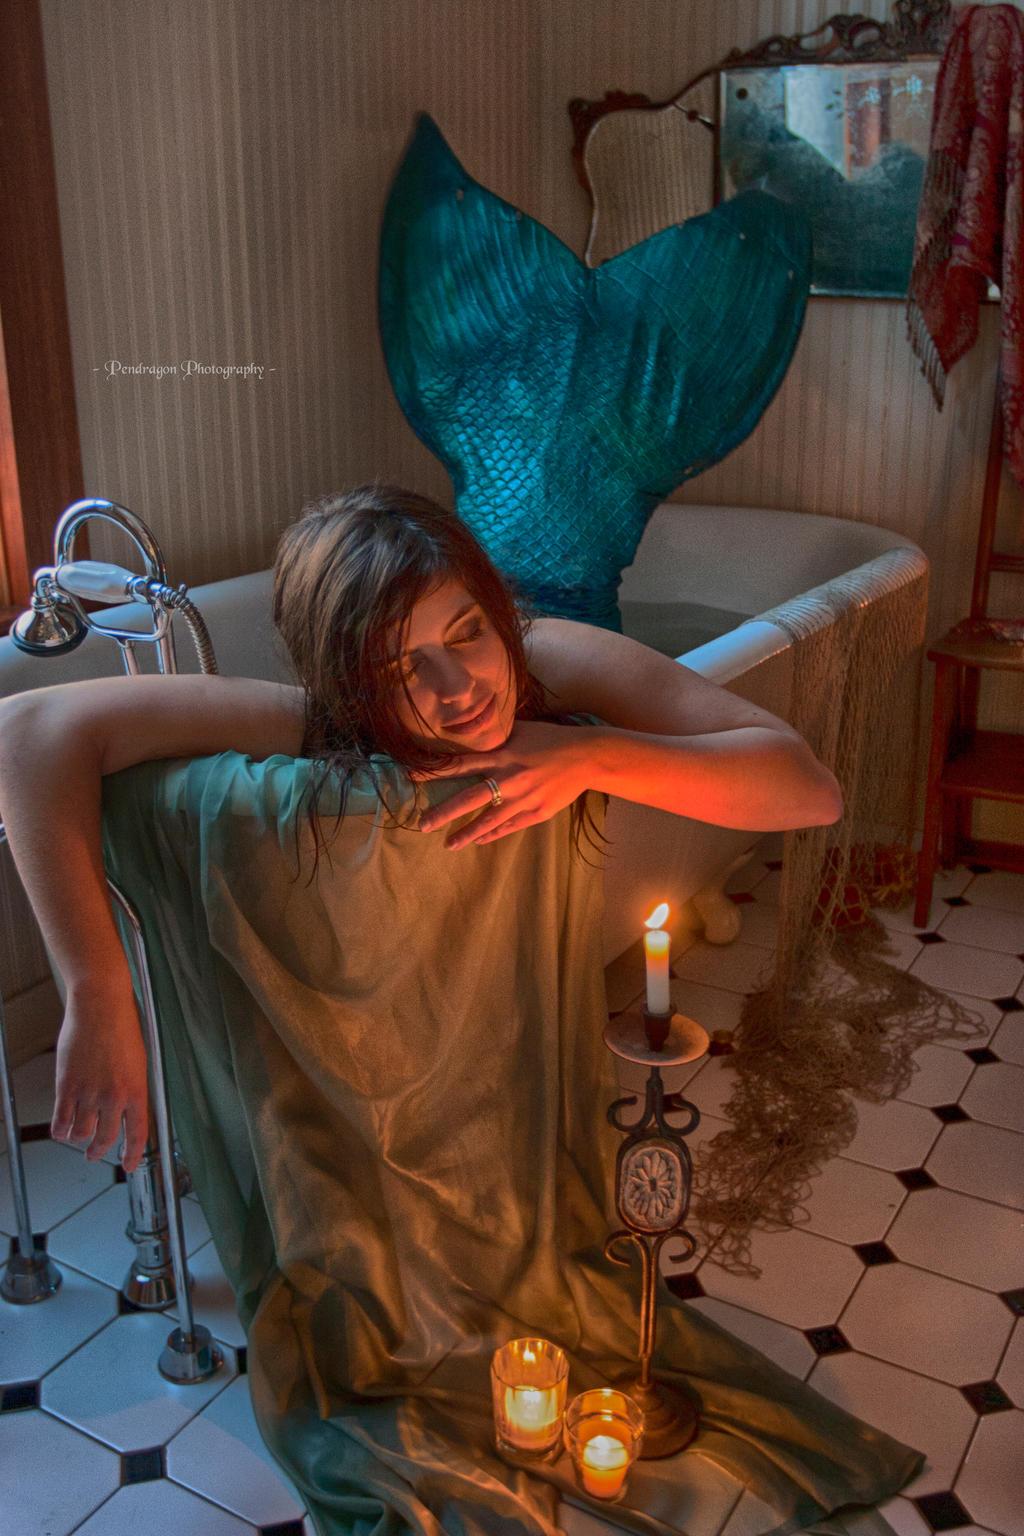 Mermaid Aiyana In the Tub by pendragon93